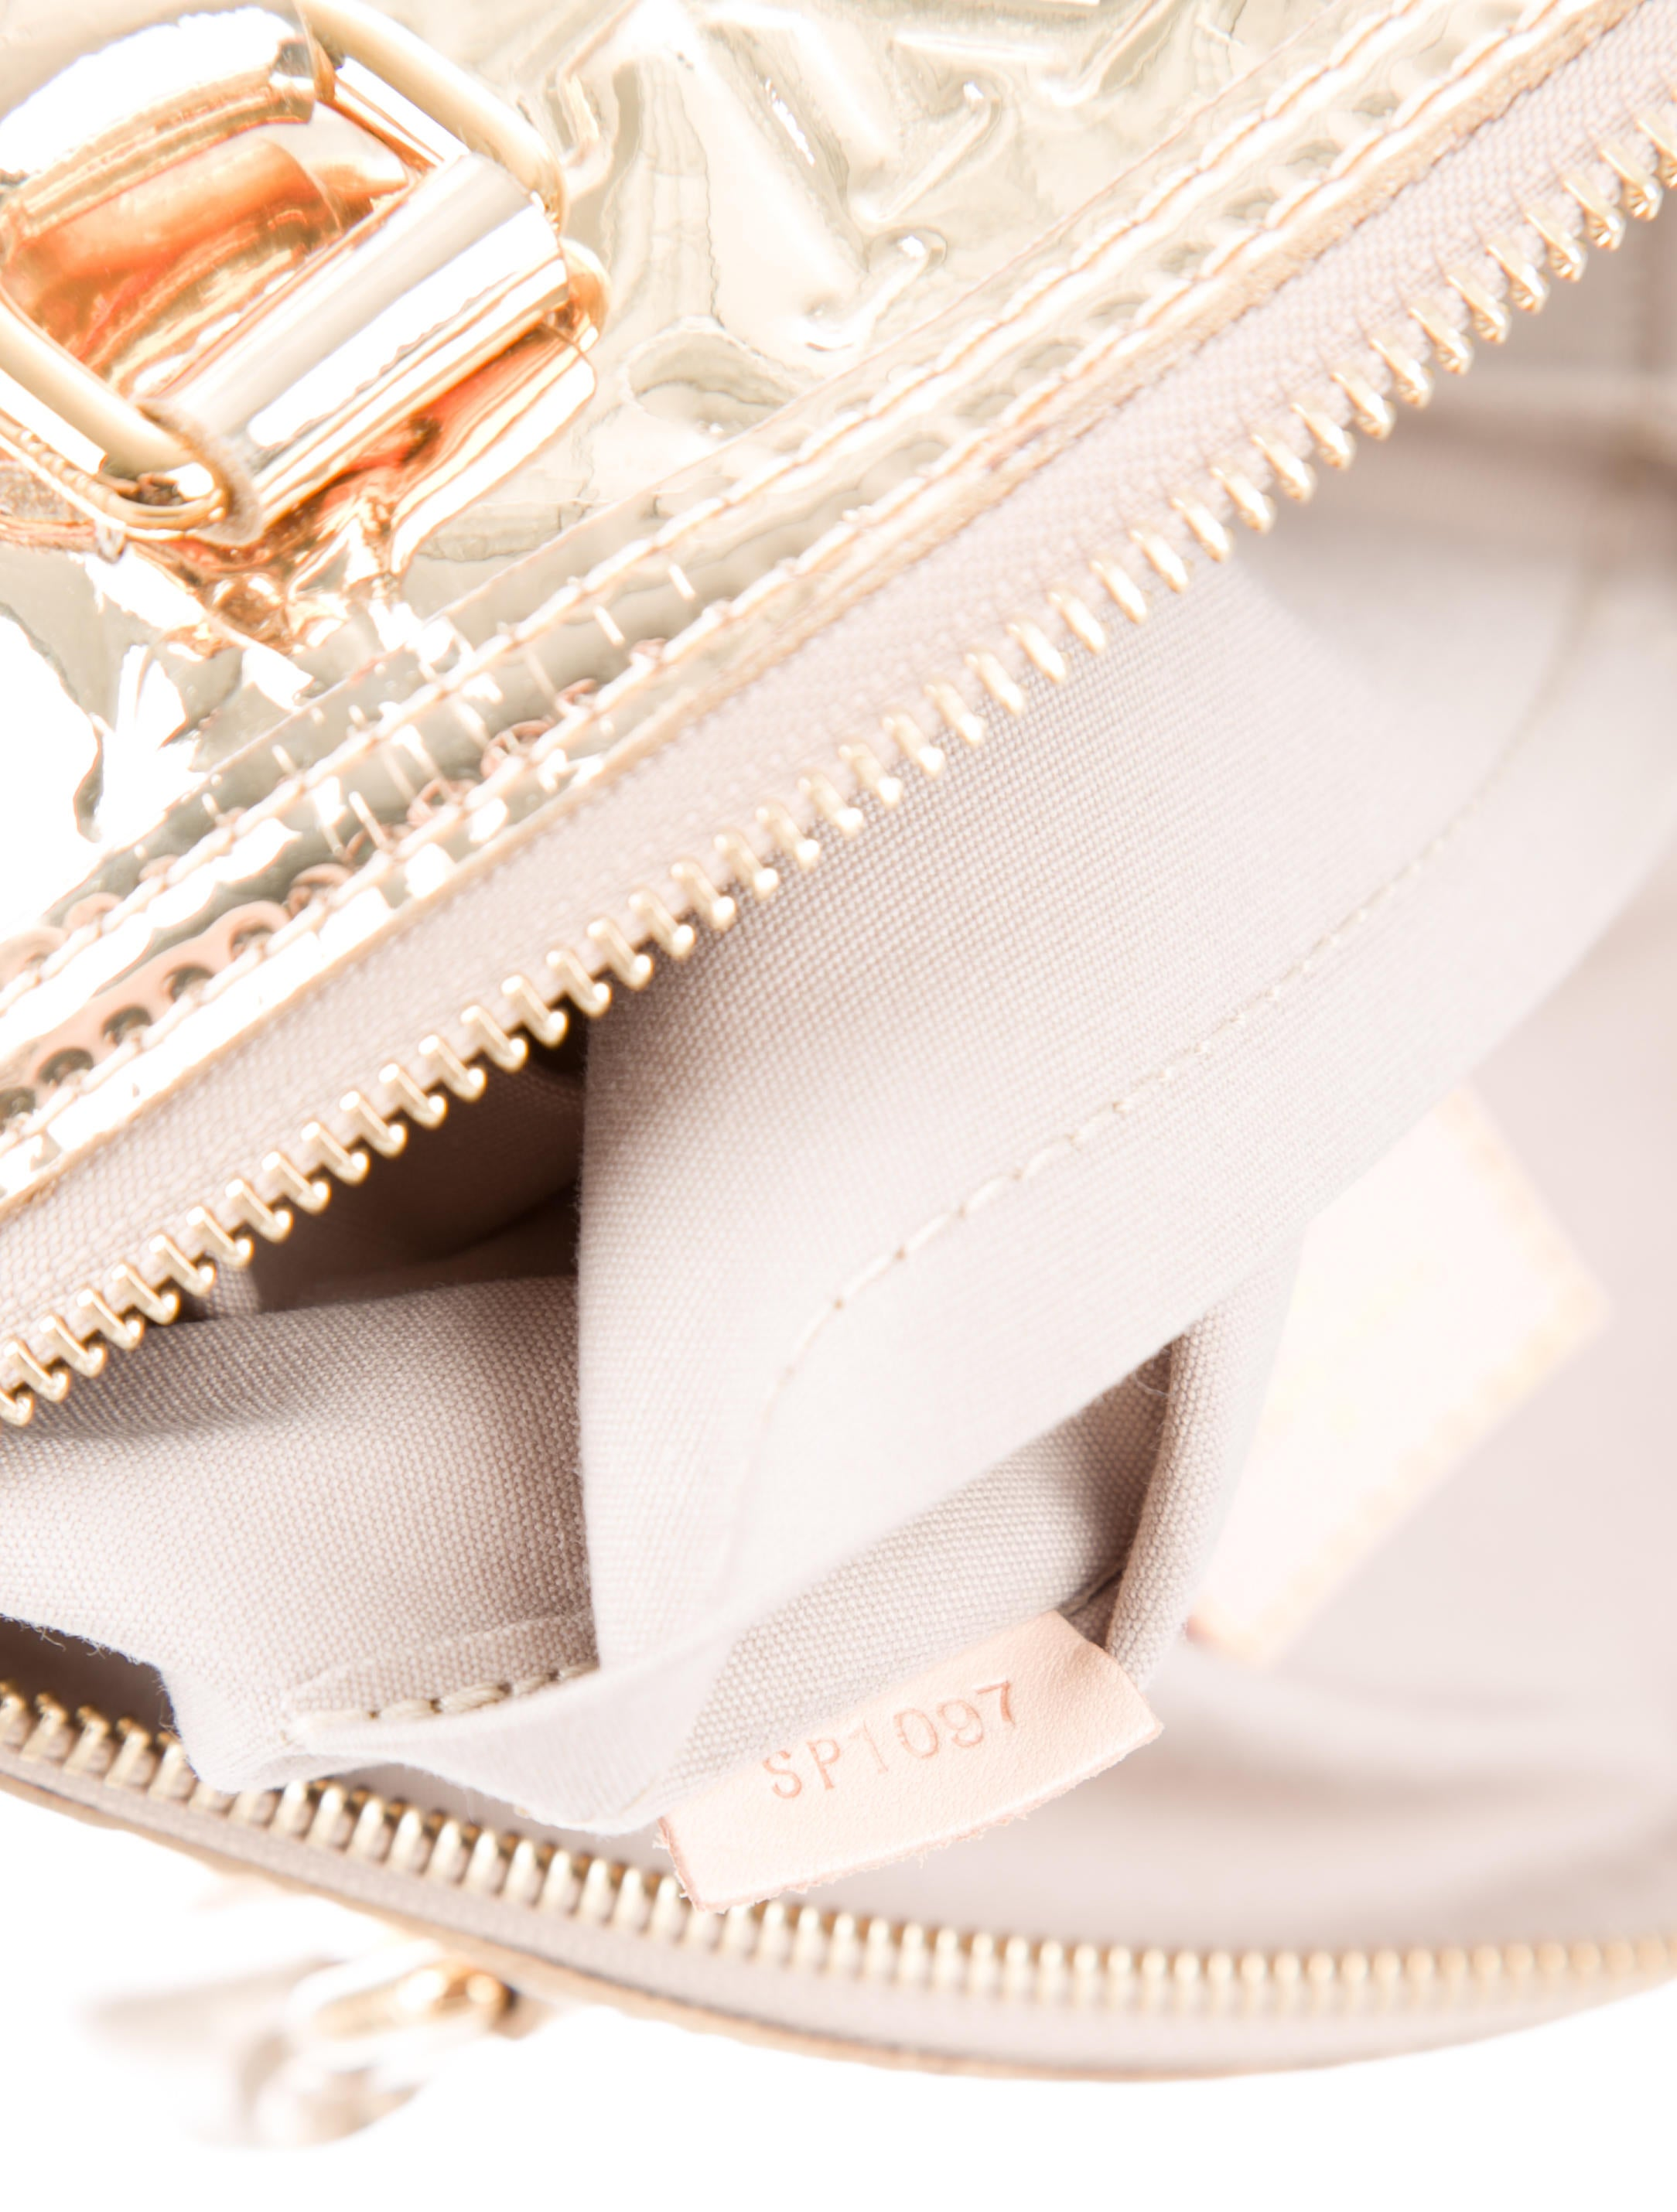 Louis vuitton miroir lockit pm handbags lou119750 for Louis vuitton miroir collection